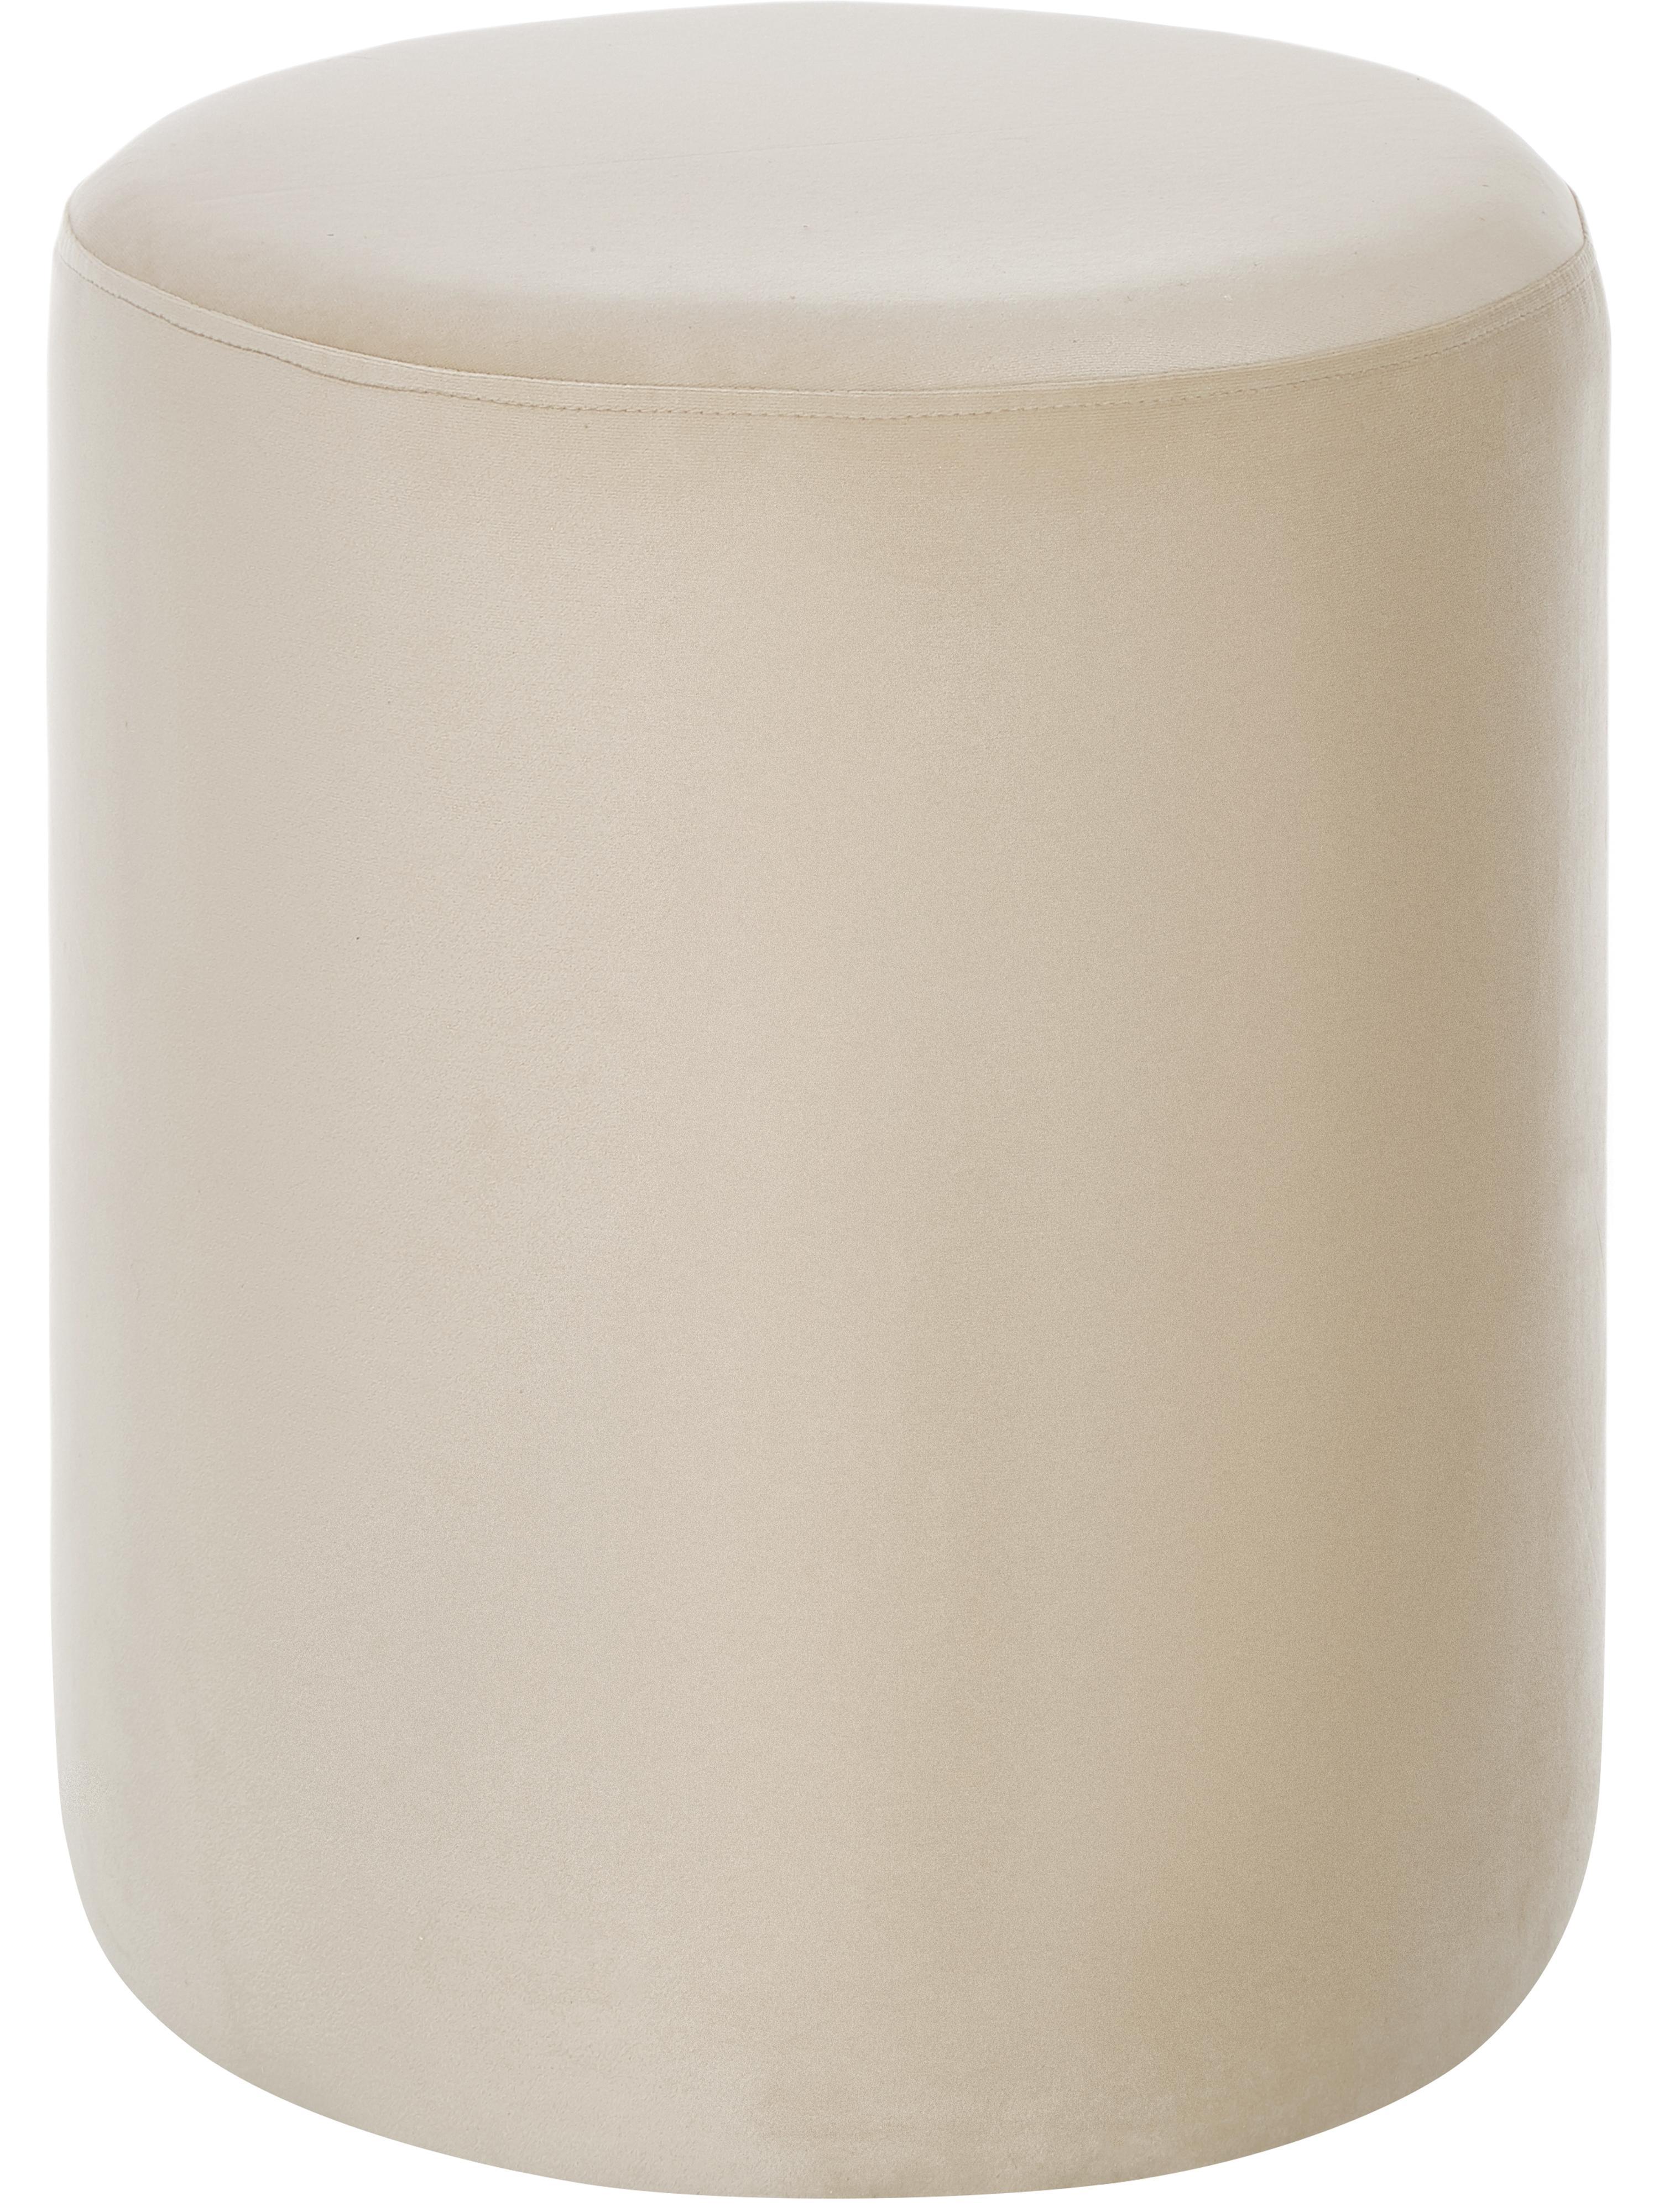 Samt-Hocker Daisy, Bezug: Samt (Polyester) Der hoch, Rahmen: Sperrholz, Samt Beige, Ø 38 x H 45 cm